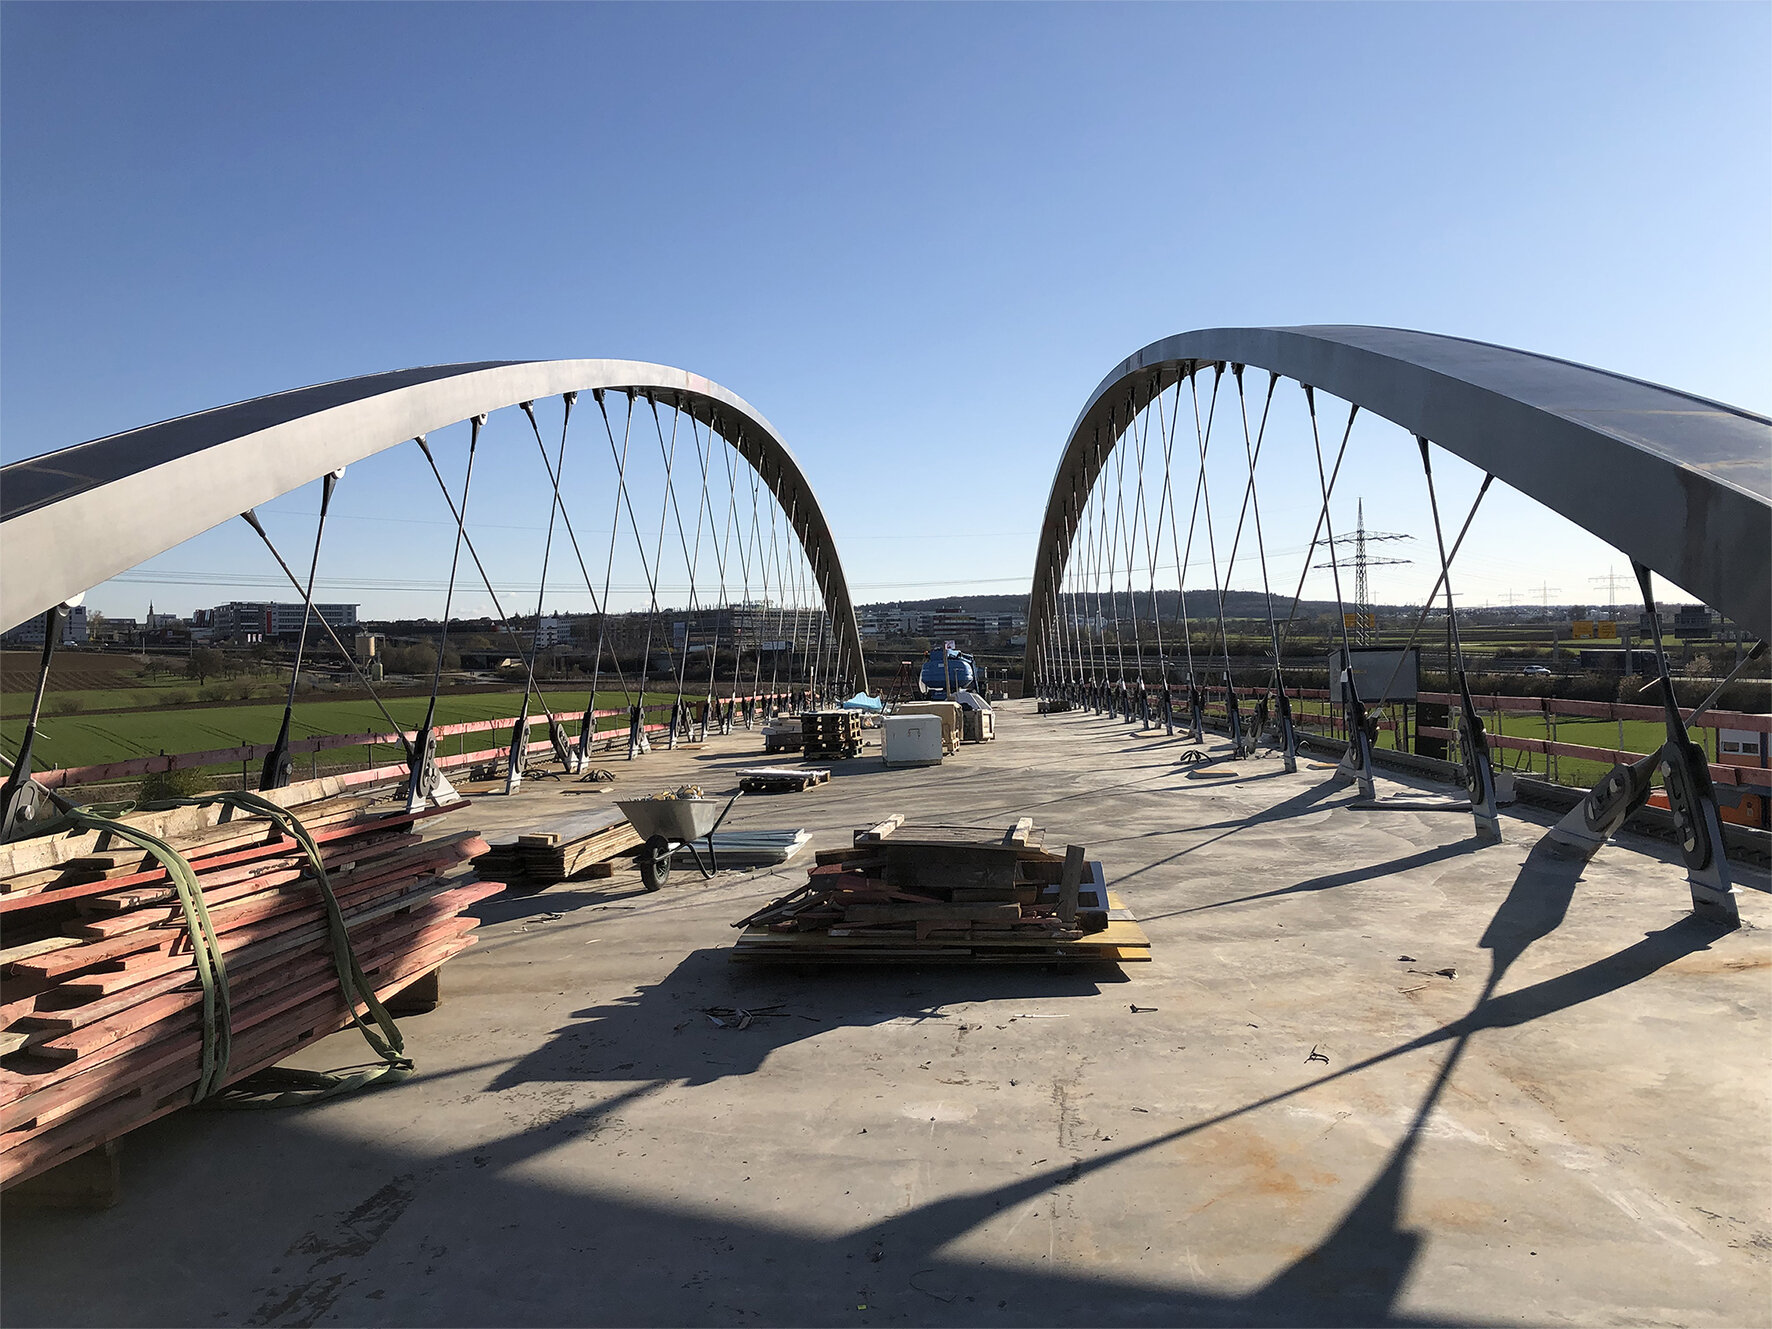 A 127-meter-long railway bridge fully suspended on CFRP hangers